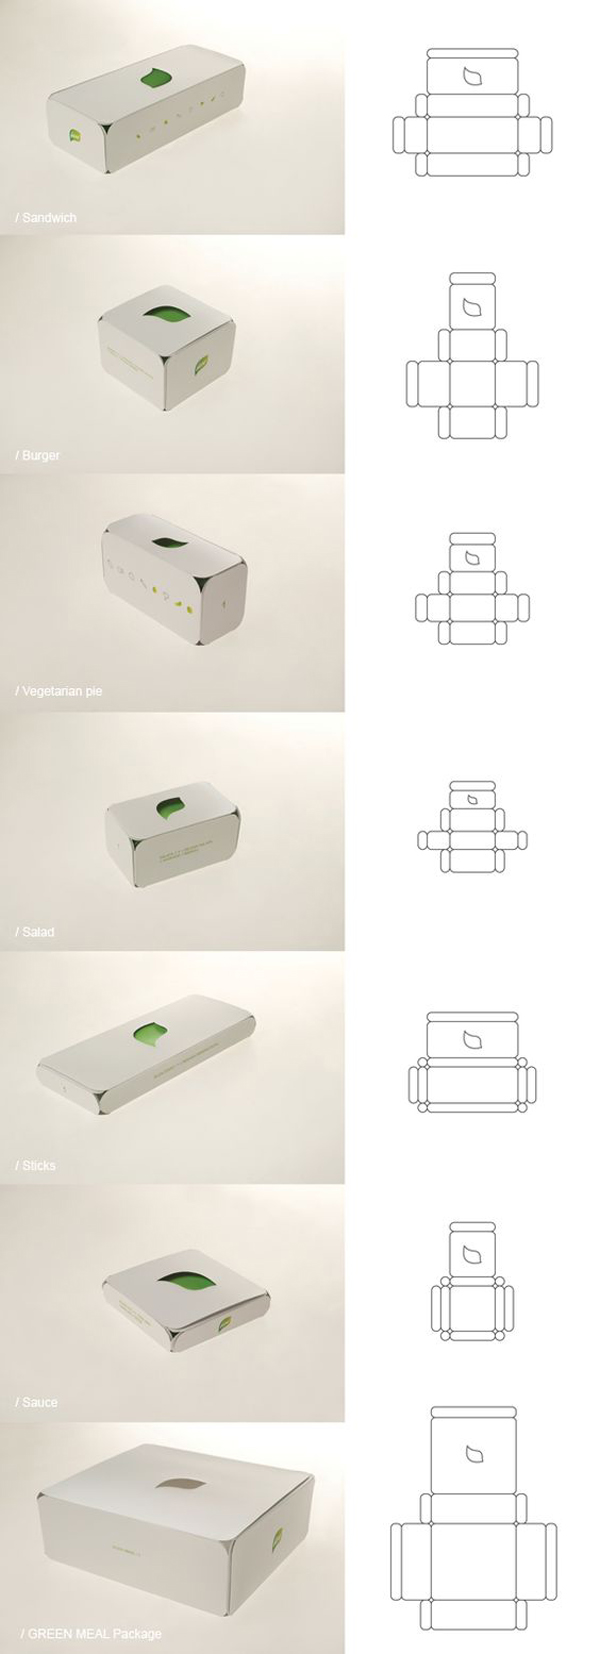 caixa de lembrancinha de papel